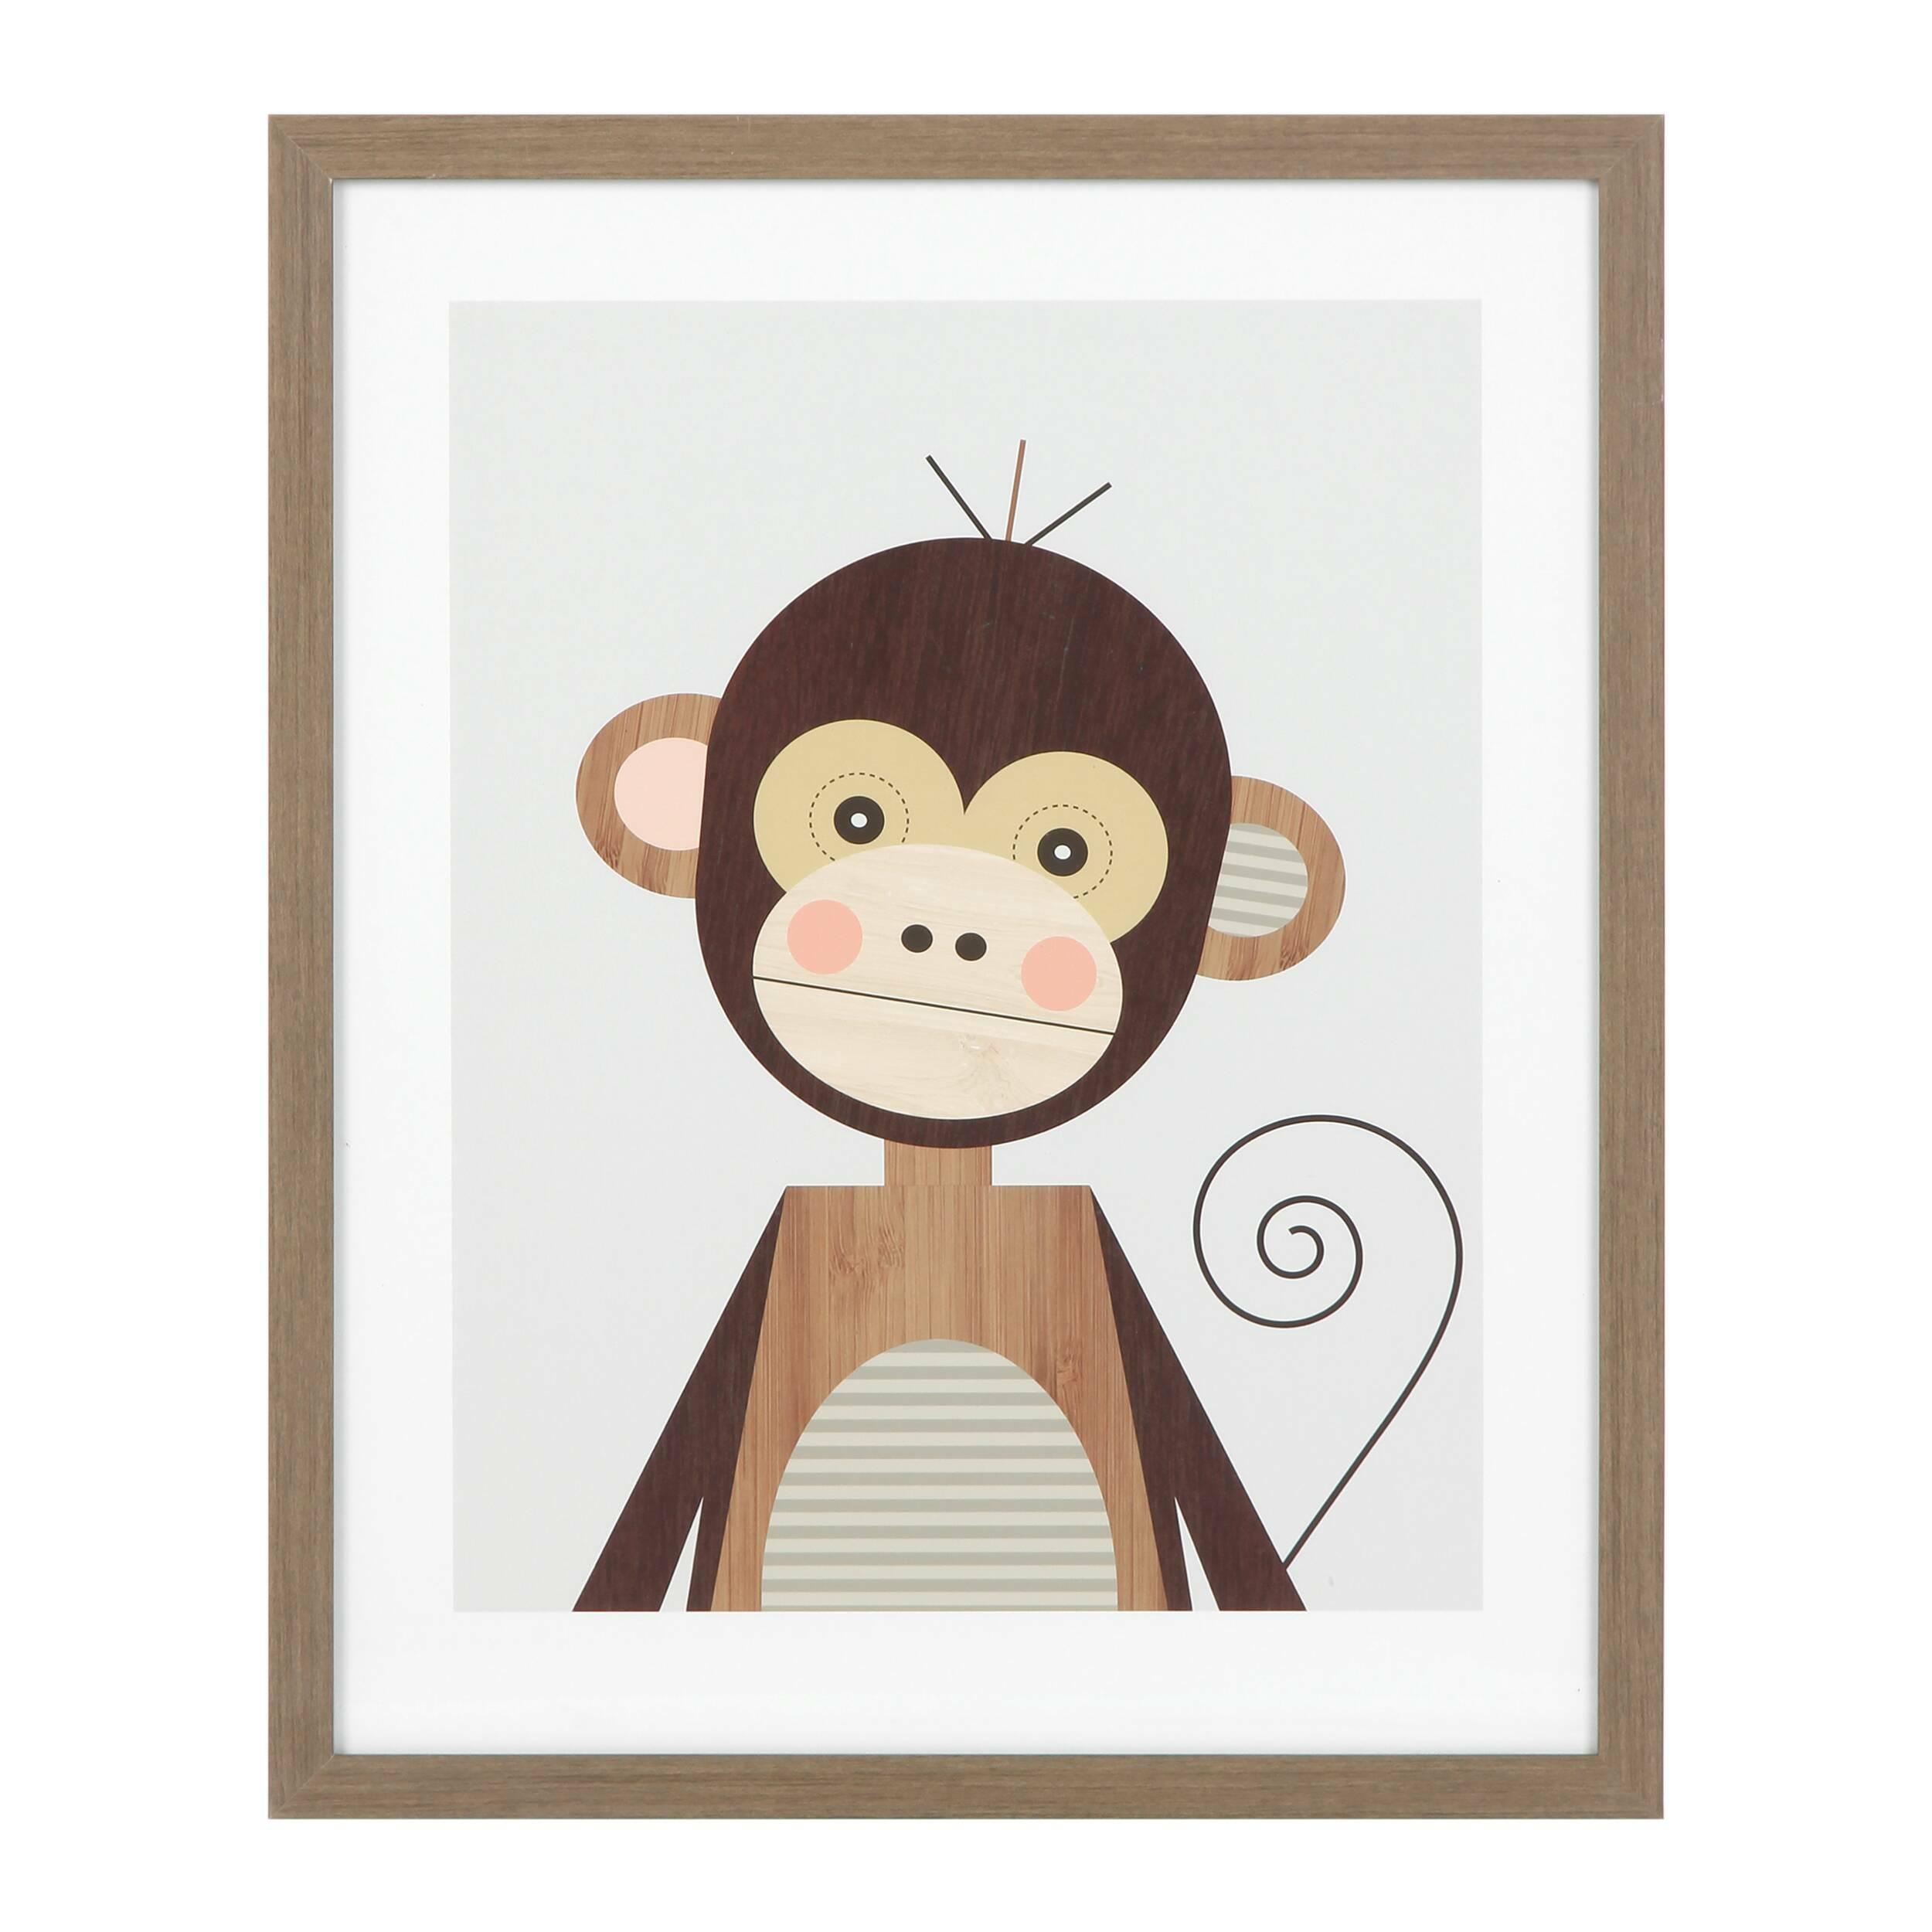 Постер MonkeyКартины<br><br><br>stock: 5<br>Ширина: 43,2<br>Цвет: Разноцветный<br>Длина: 53,2